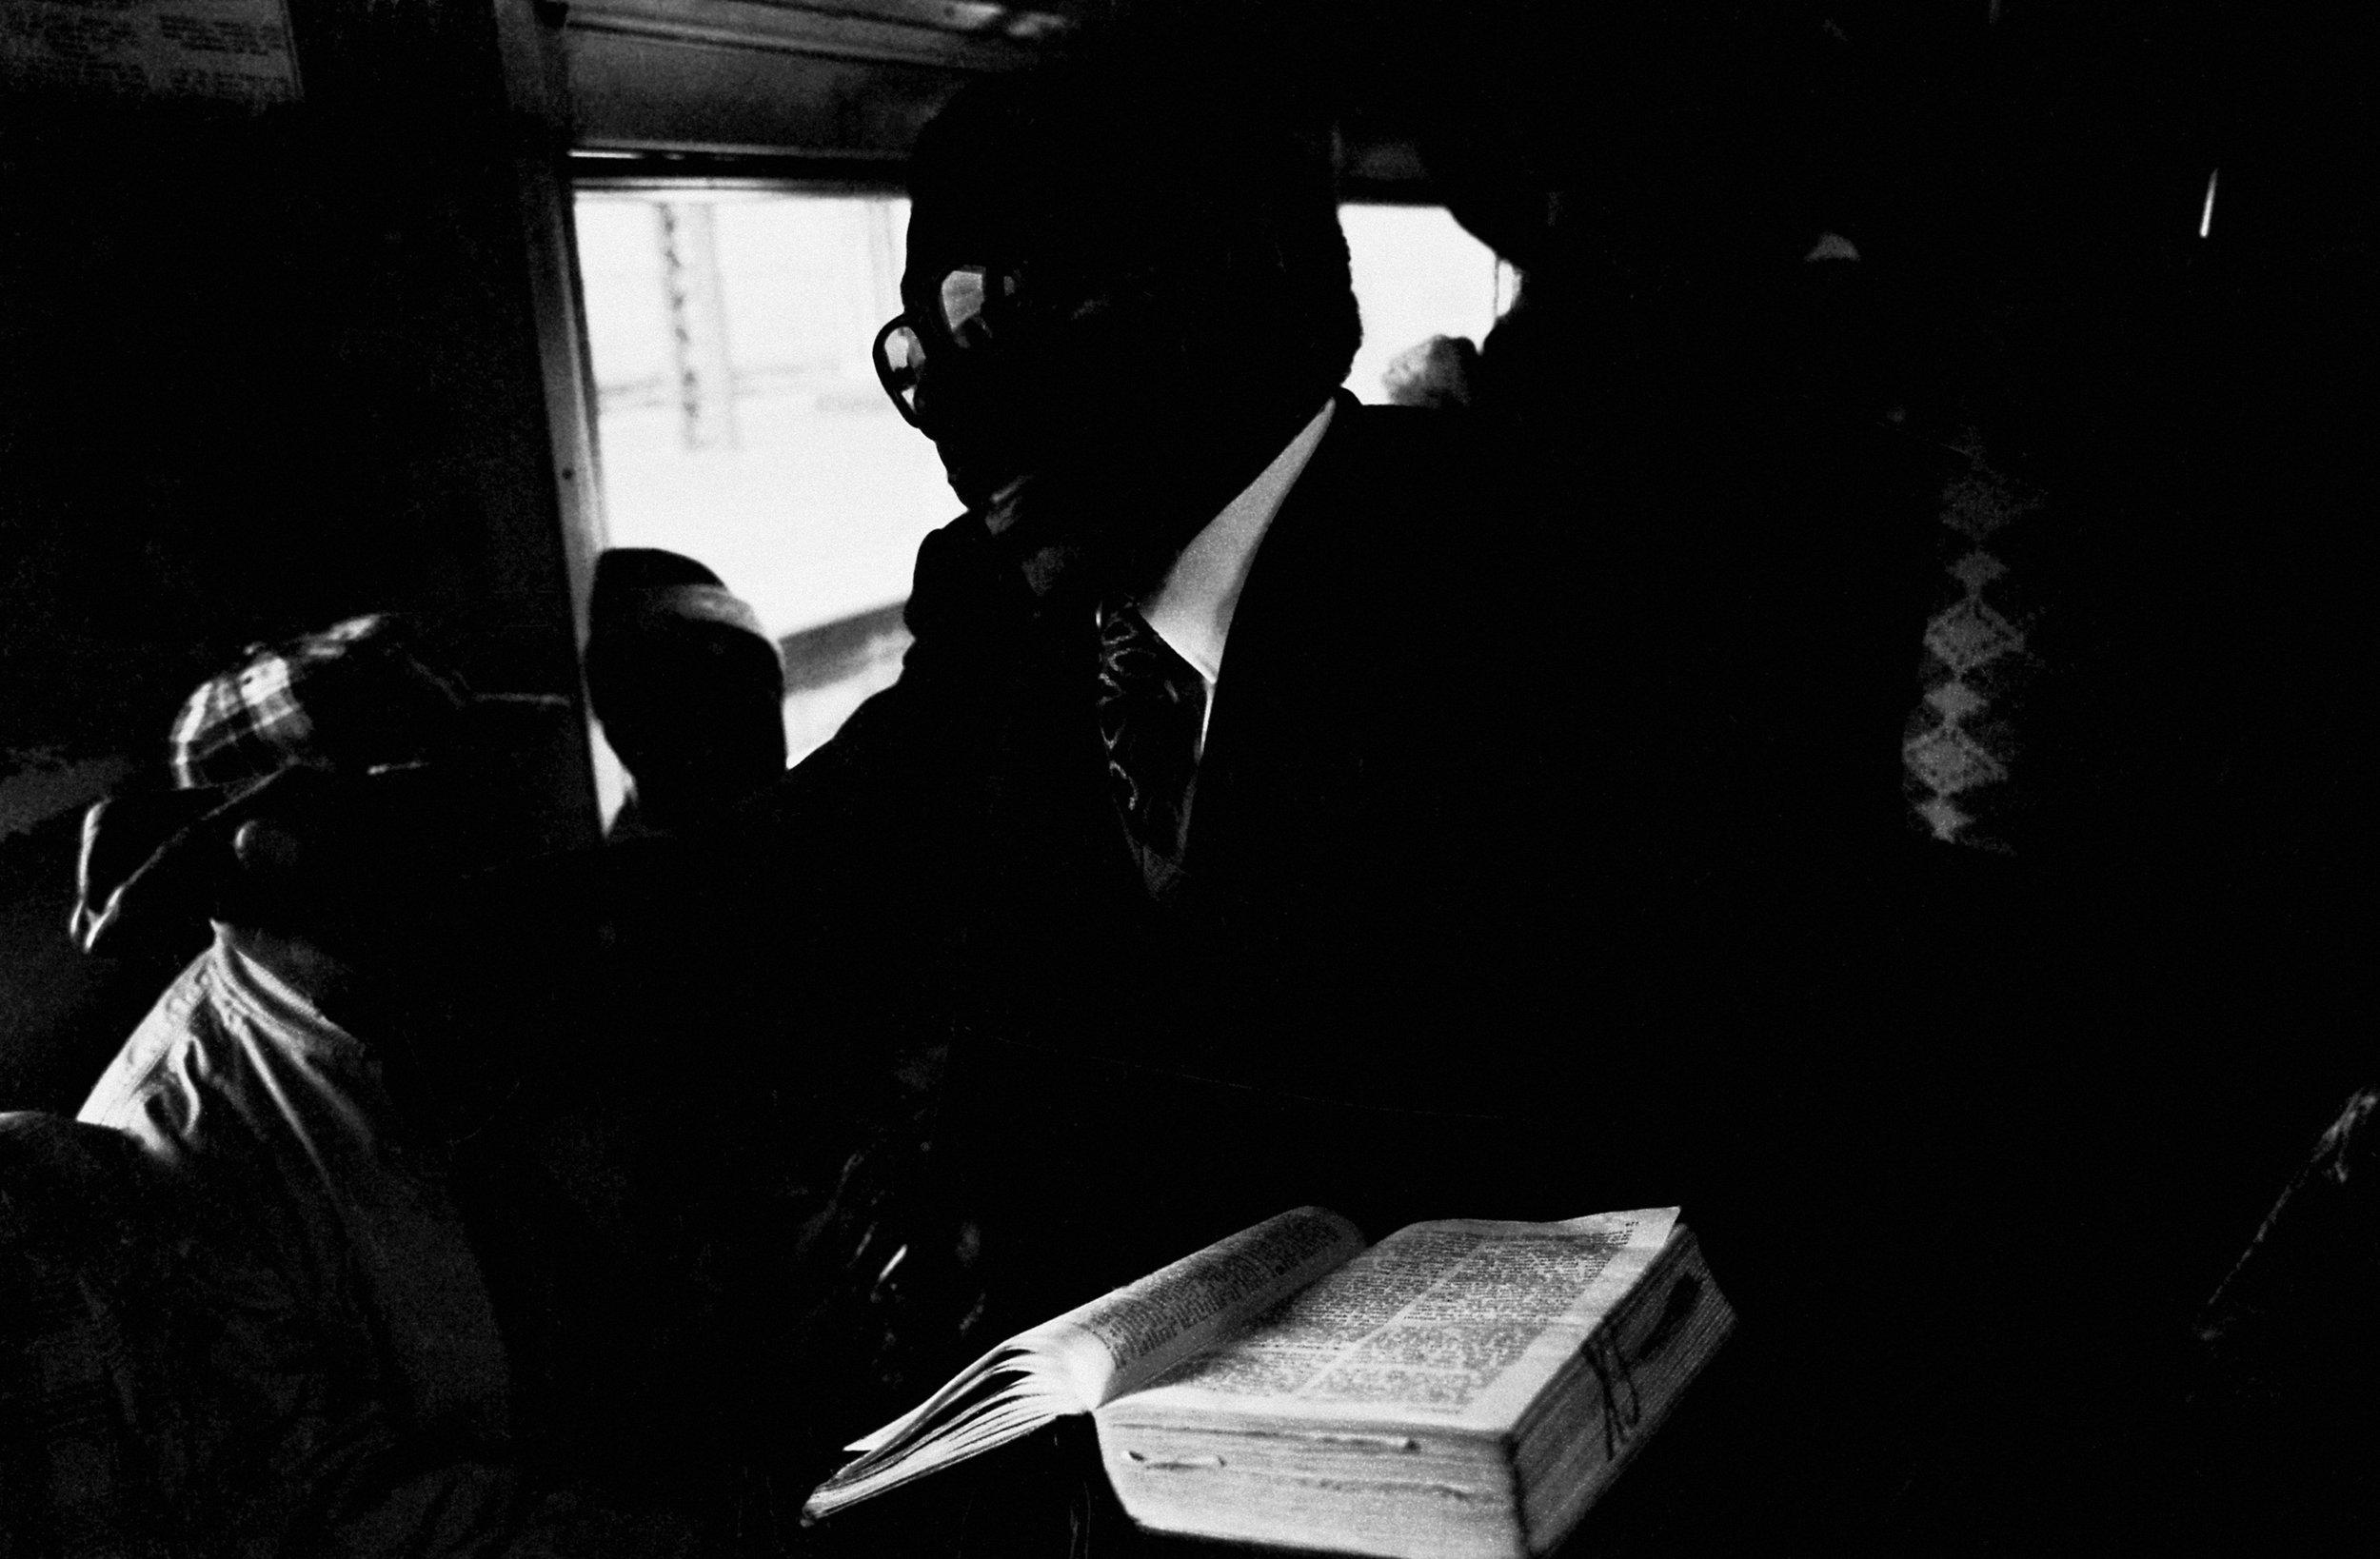 The Book, Johannesburg–Soweto Line , 1986. Photograph by Santu Mofokeng, ©Santu Mofokeng Foundation. Images courtesy Lunetta Bartz, MAKER, Johannesburg.